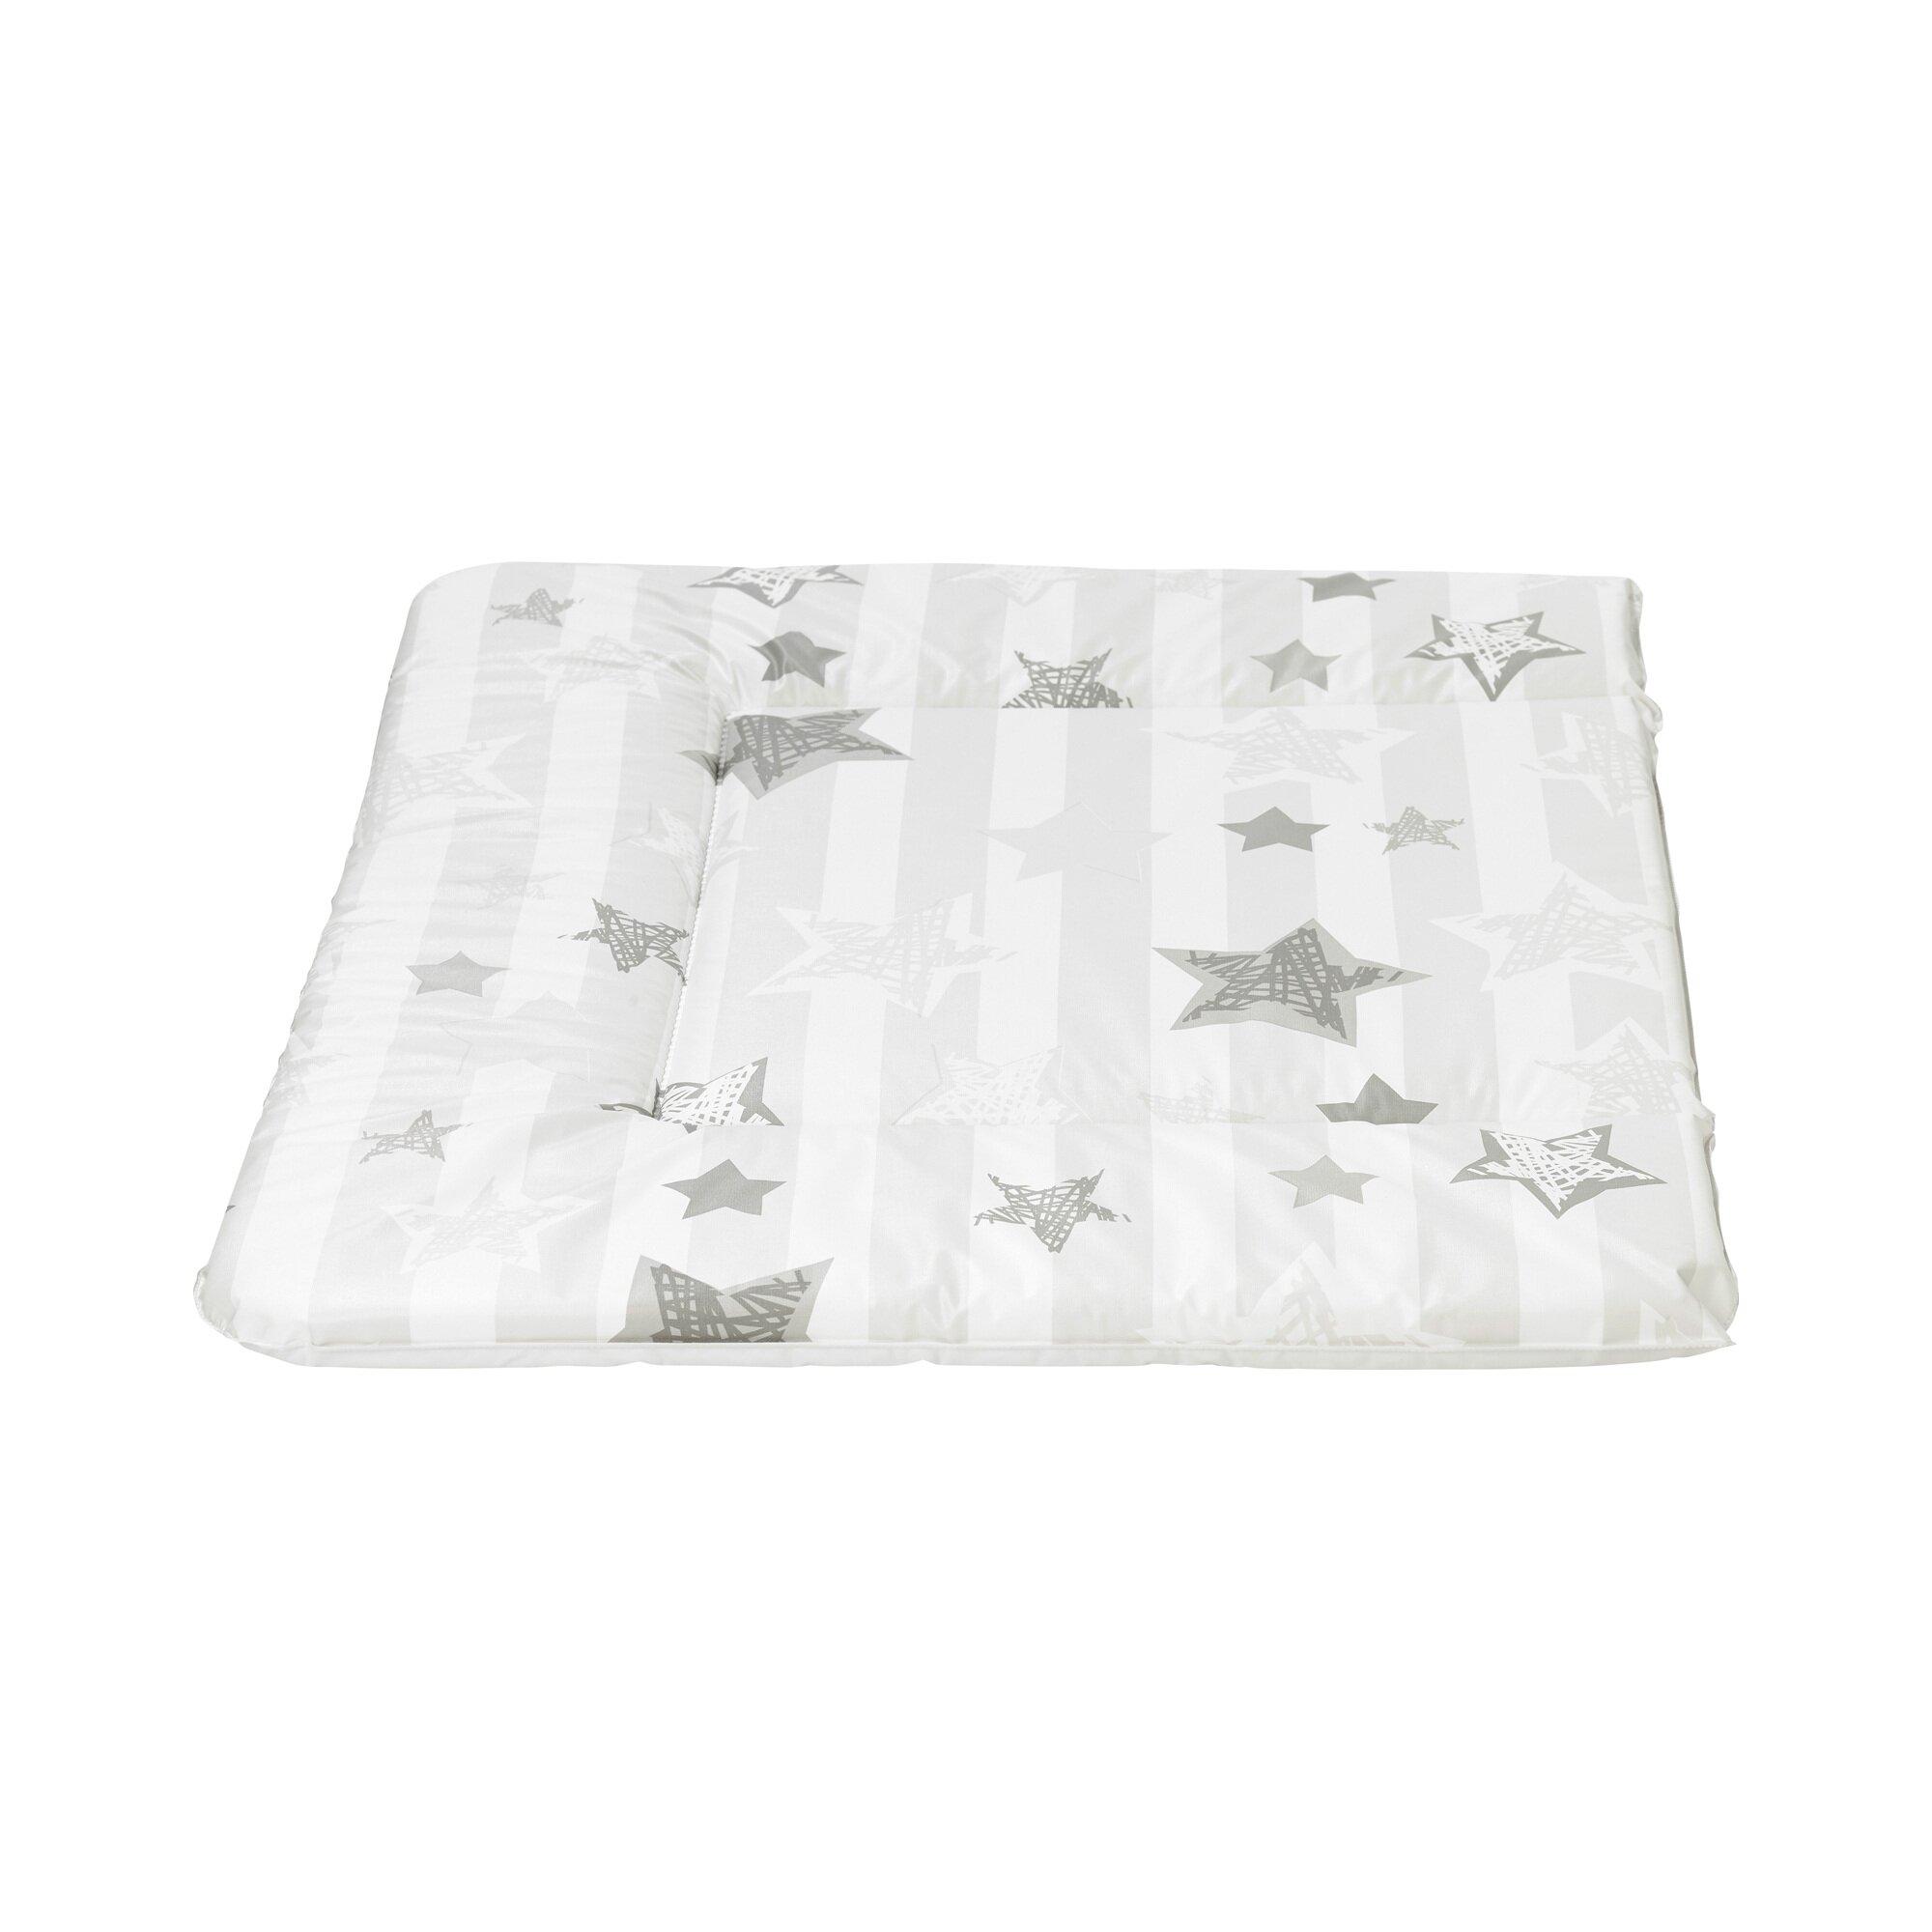 alvi-wickelauflage-basic-comfort-silver-star-70x85-cm